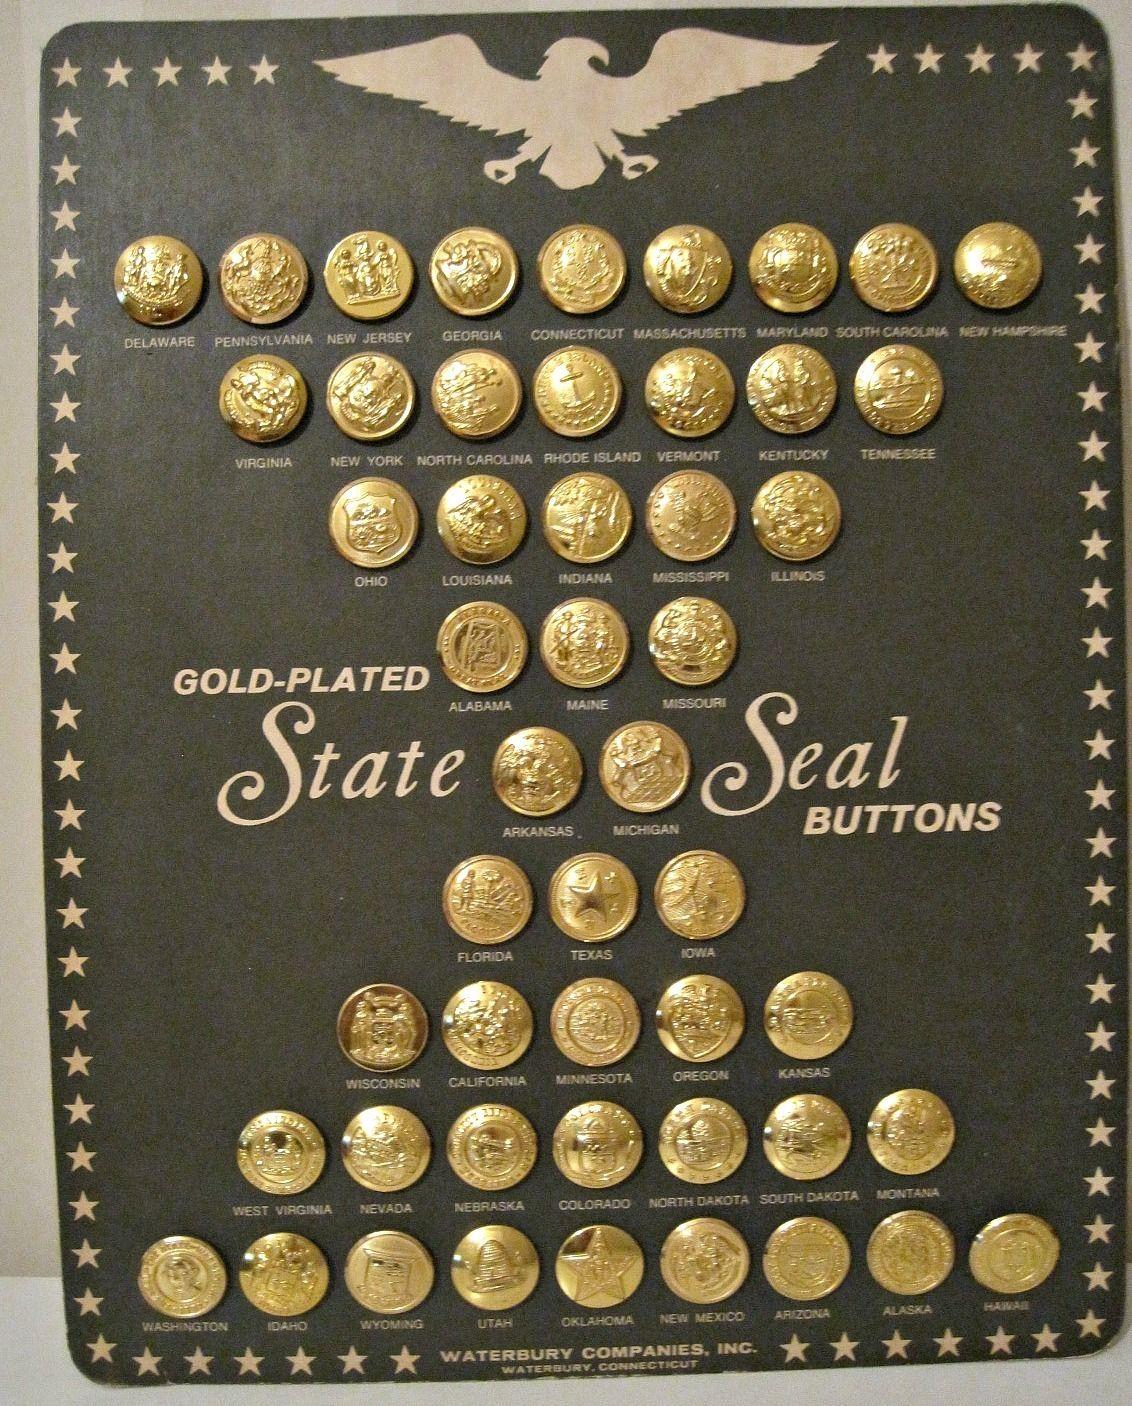 ButtonArtMuseum.com - Waterbury State Seal Buttons Gold